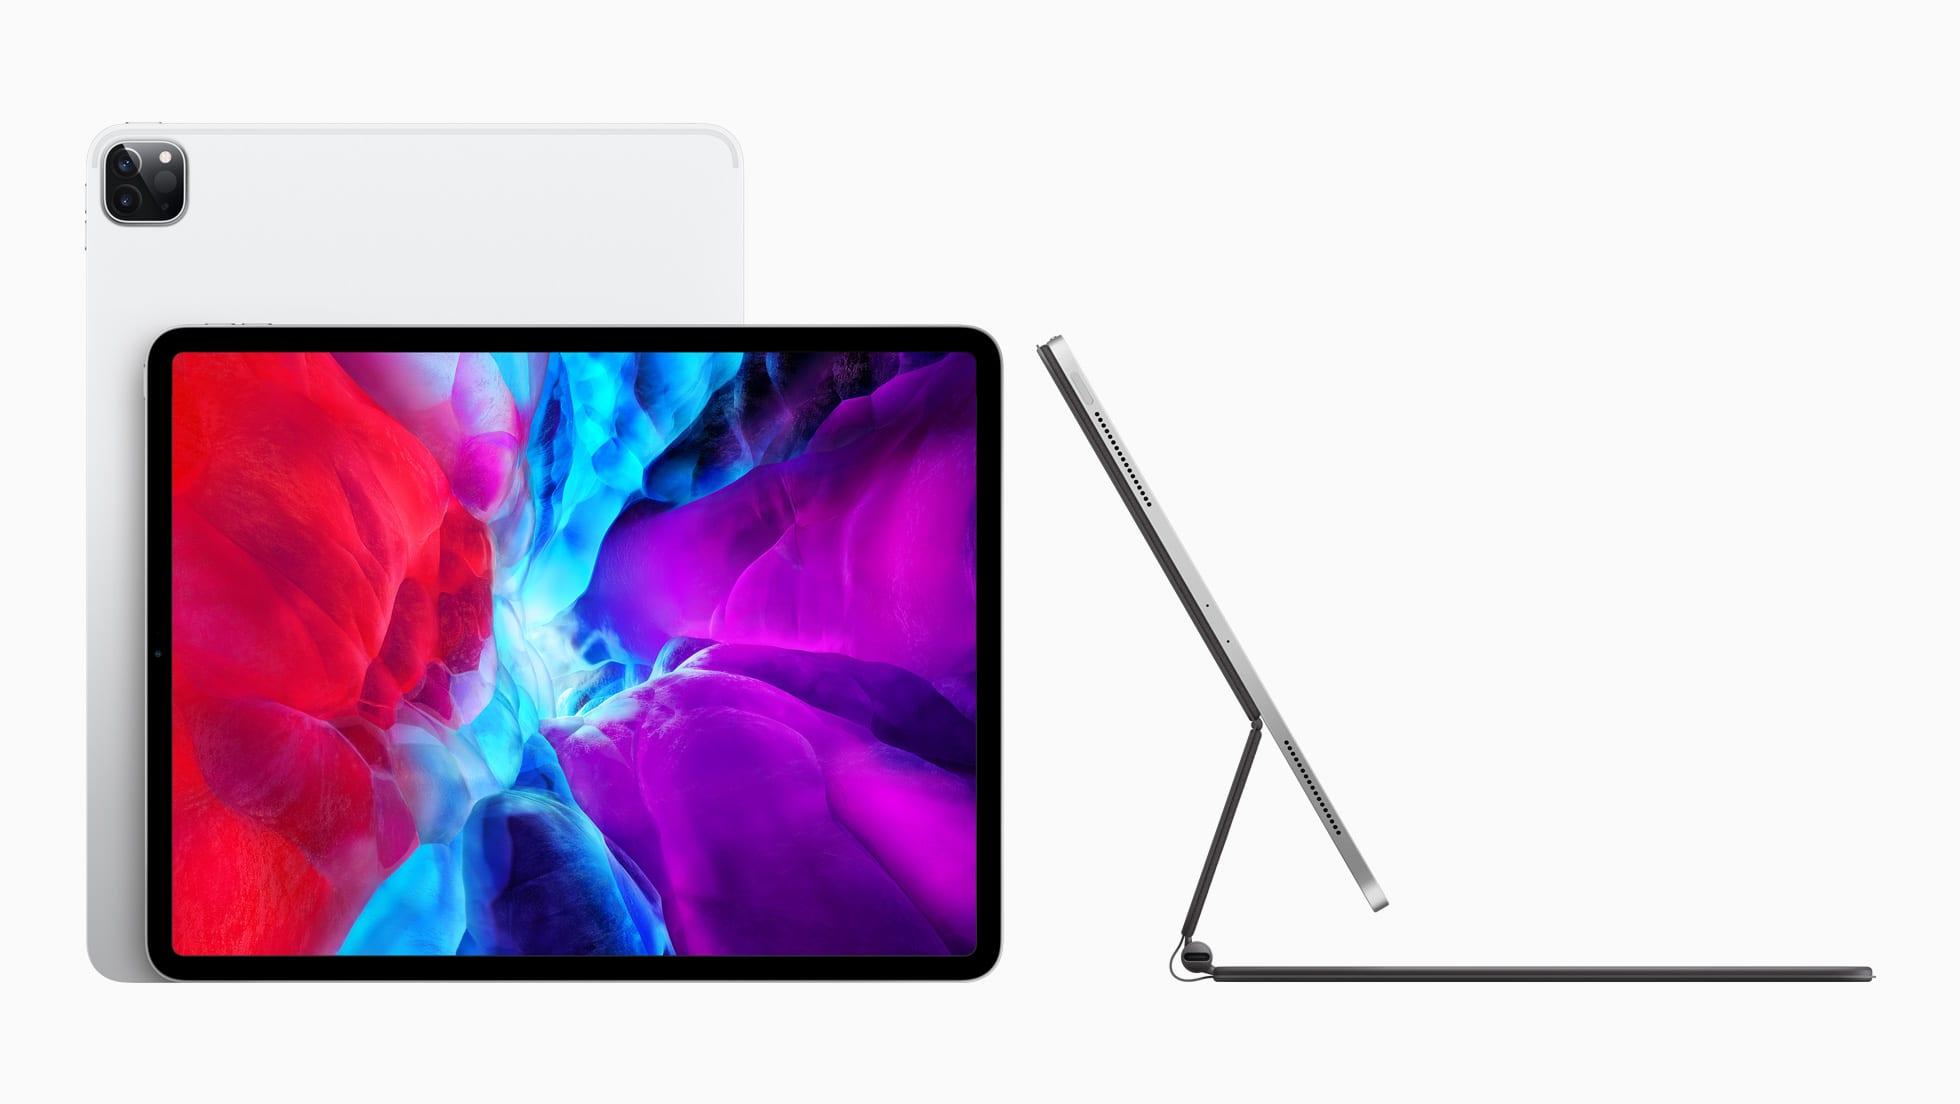 Apple new iPad Pro 03182020 - Apple predstavil nový iPad Pro a Magic Keyboard s LED podsvietením - aktualizácia